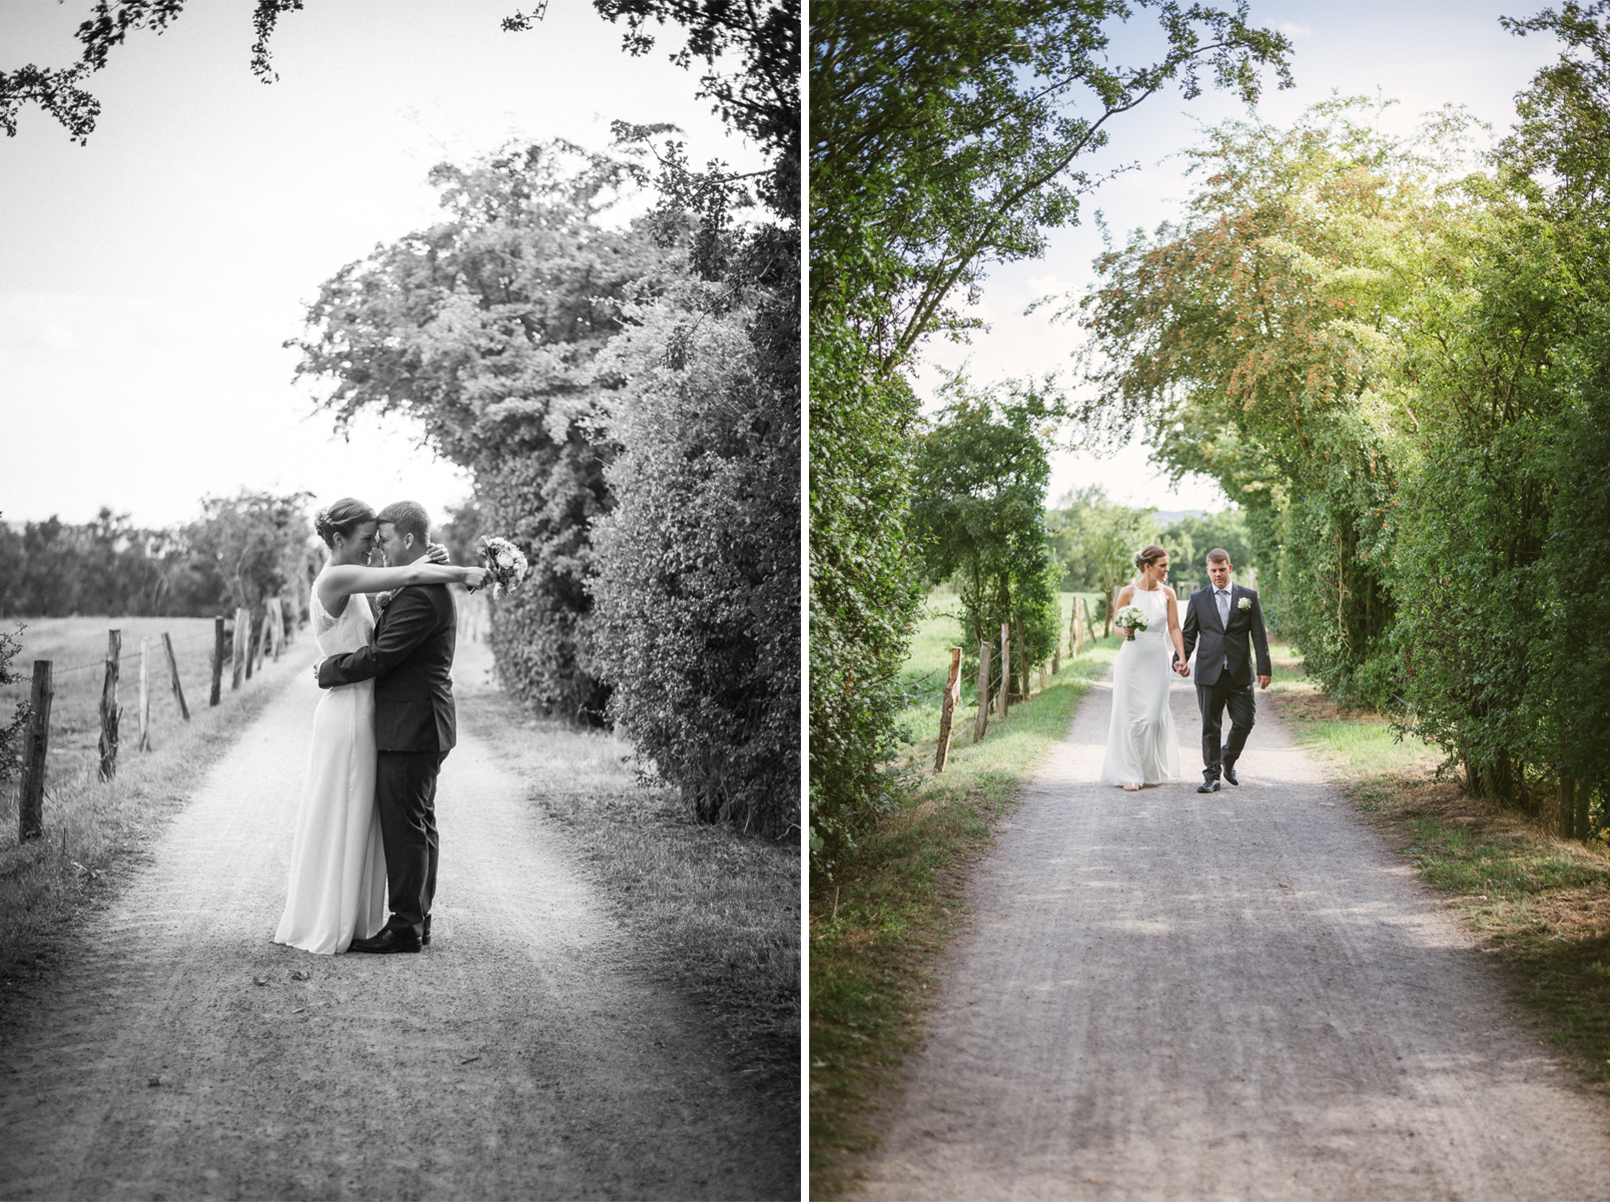 Hochzeitsfotograf-Fotografie-Aachen-Lua-Pauline-Dreamcatcher-0051